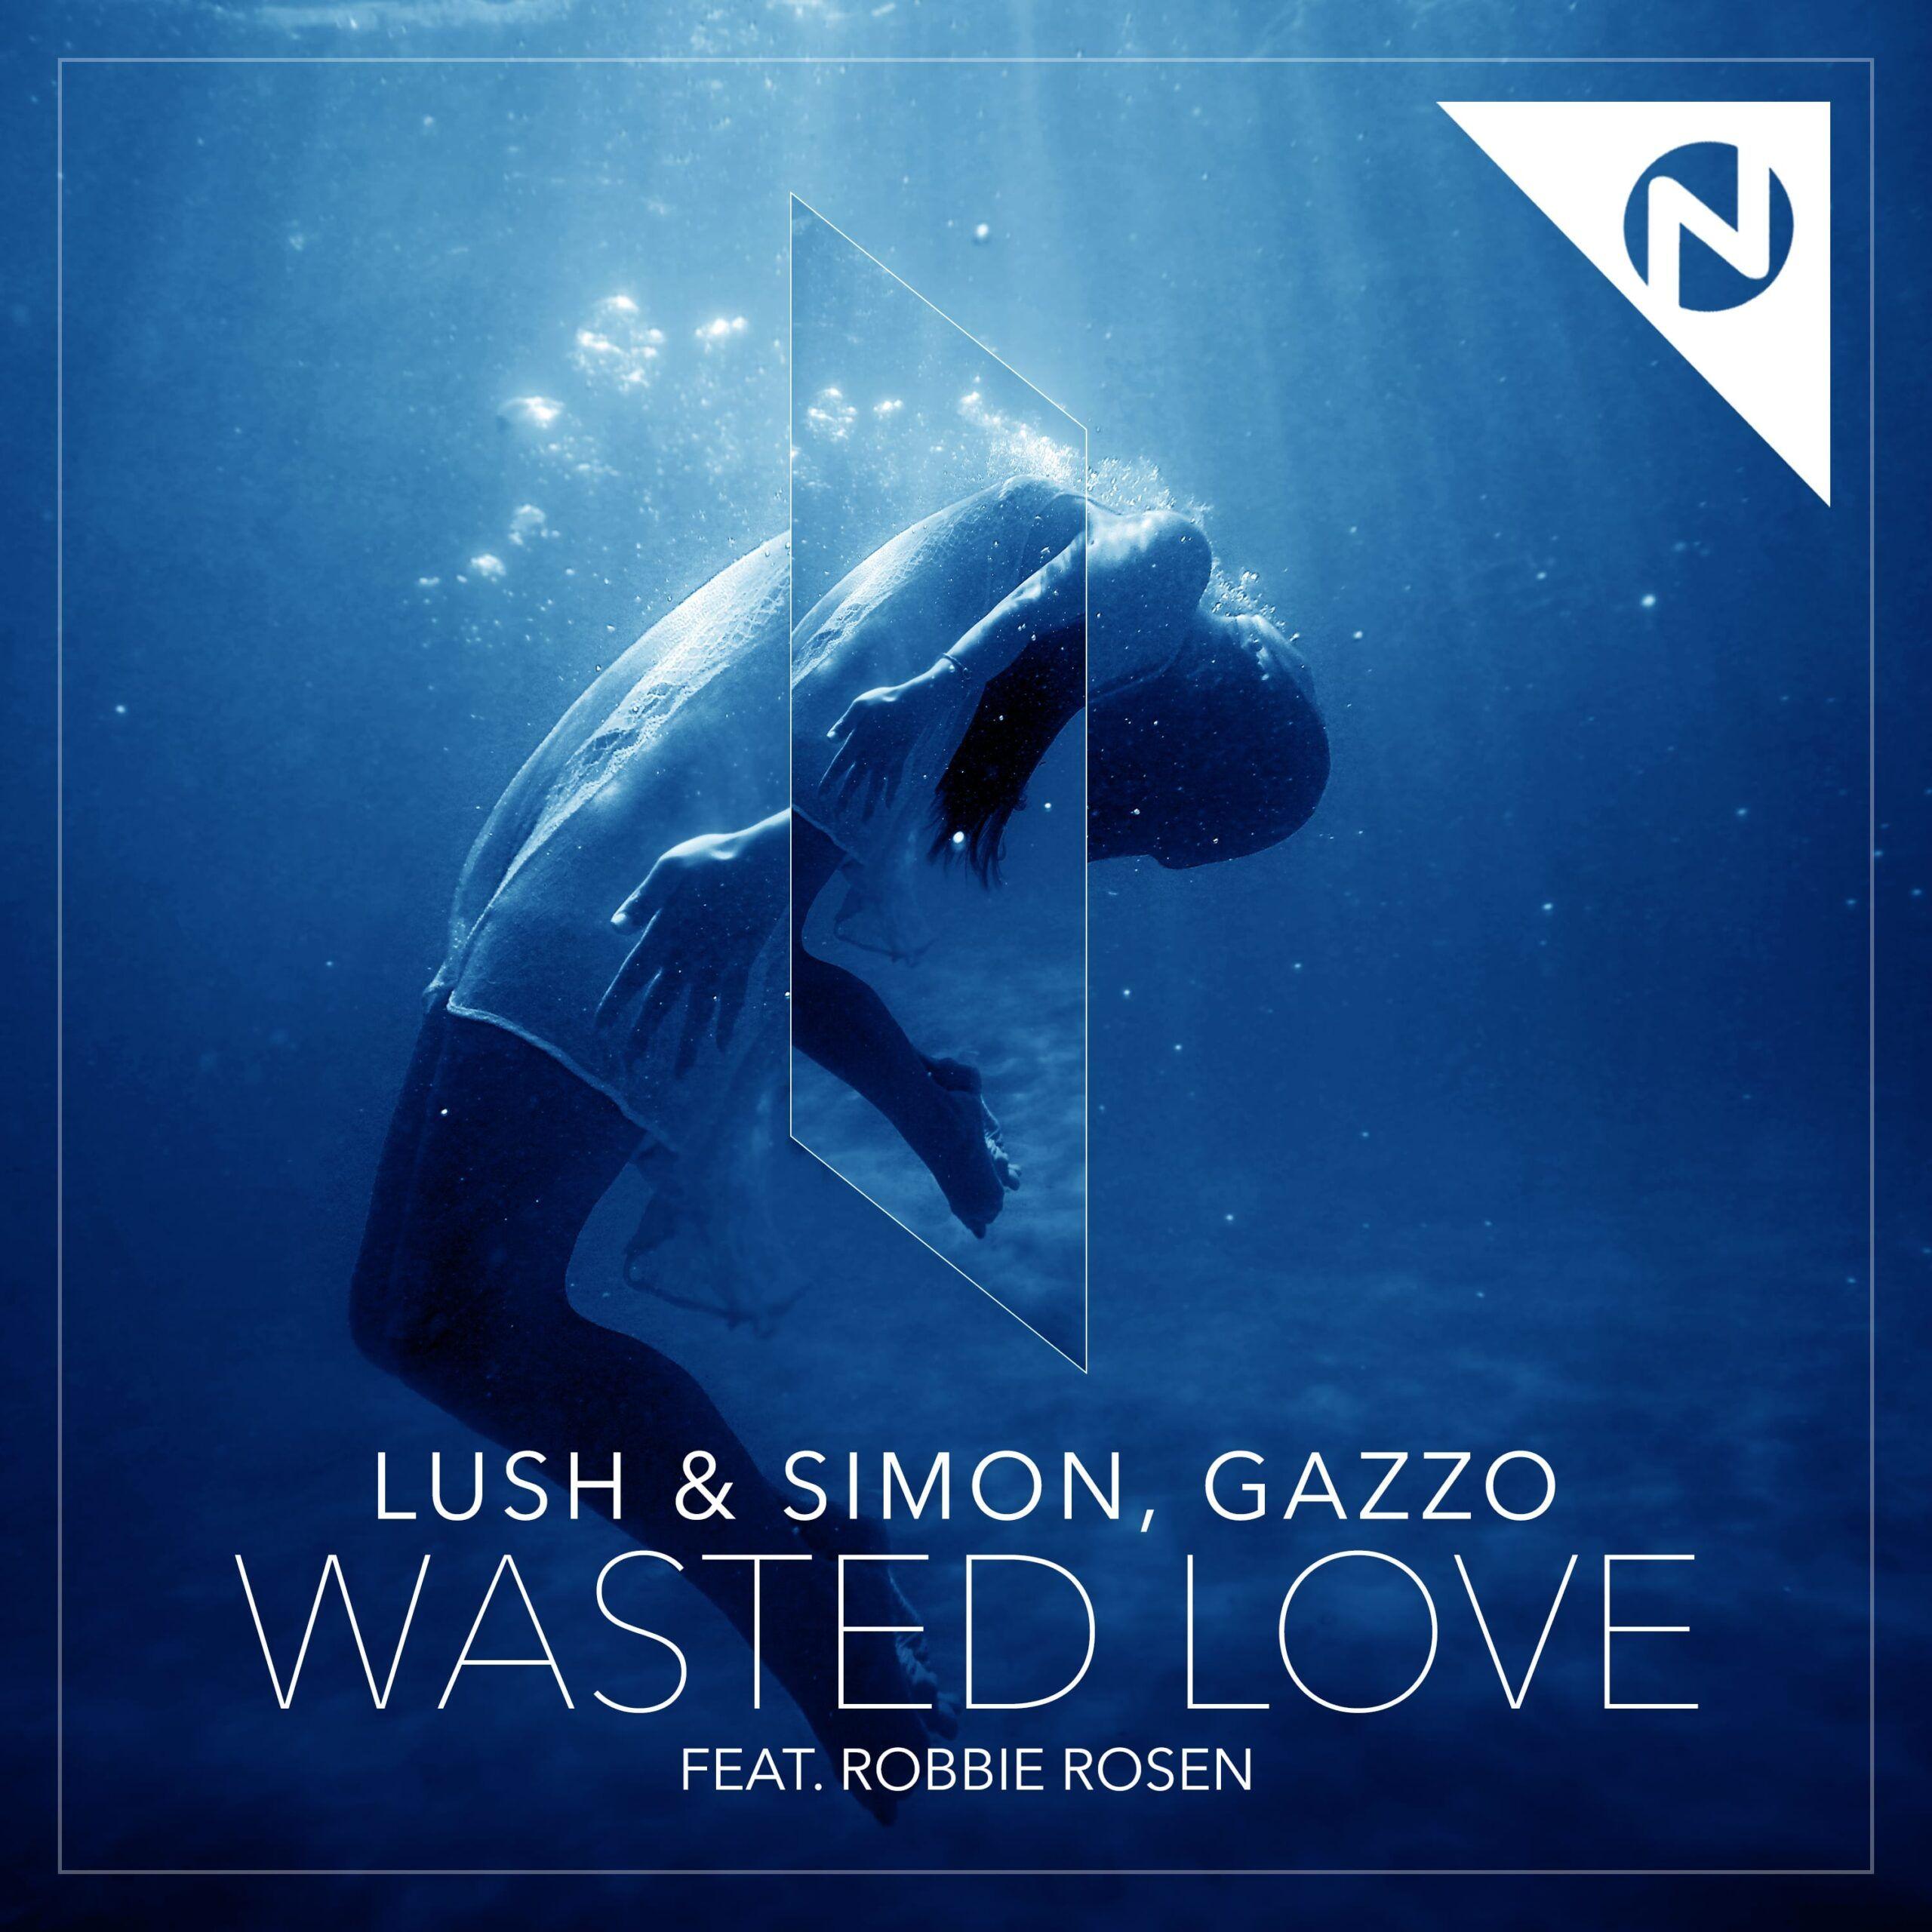 lushsimon_gazzo_-_wasted_love_cover.jpg